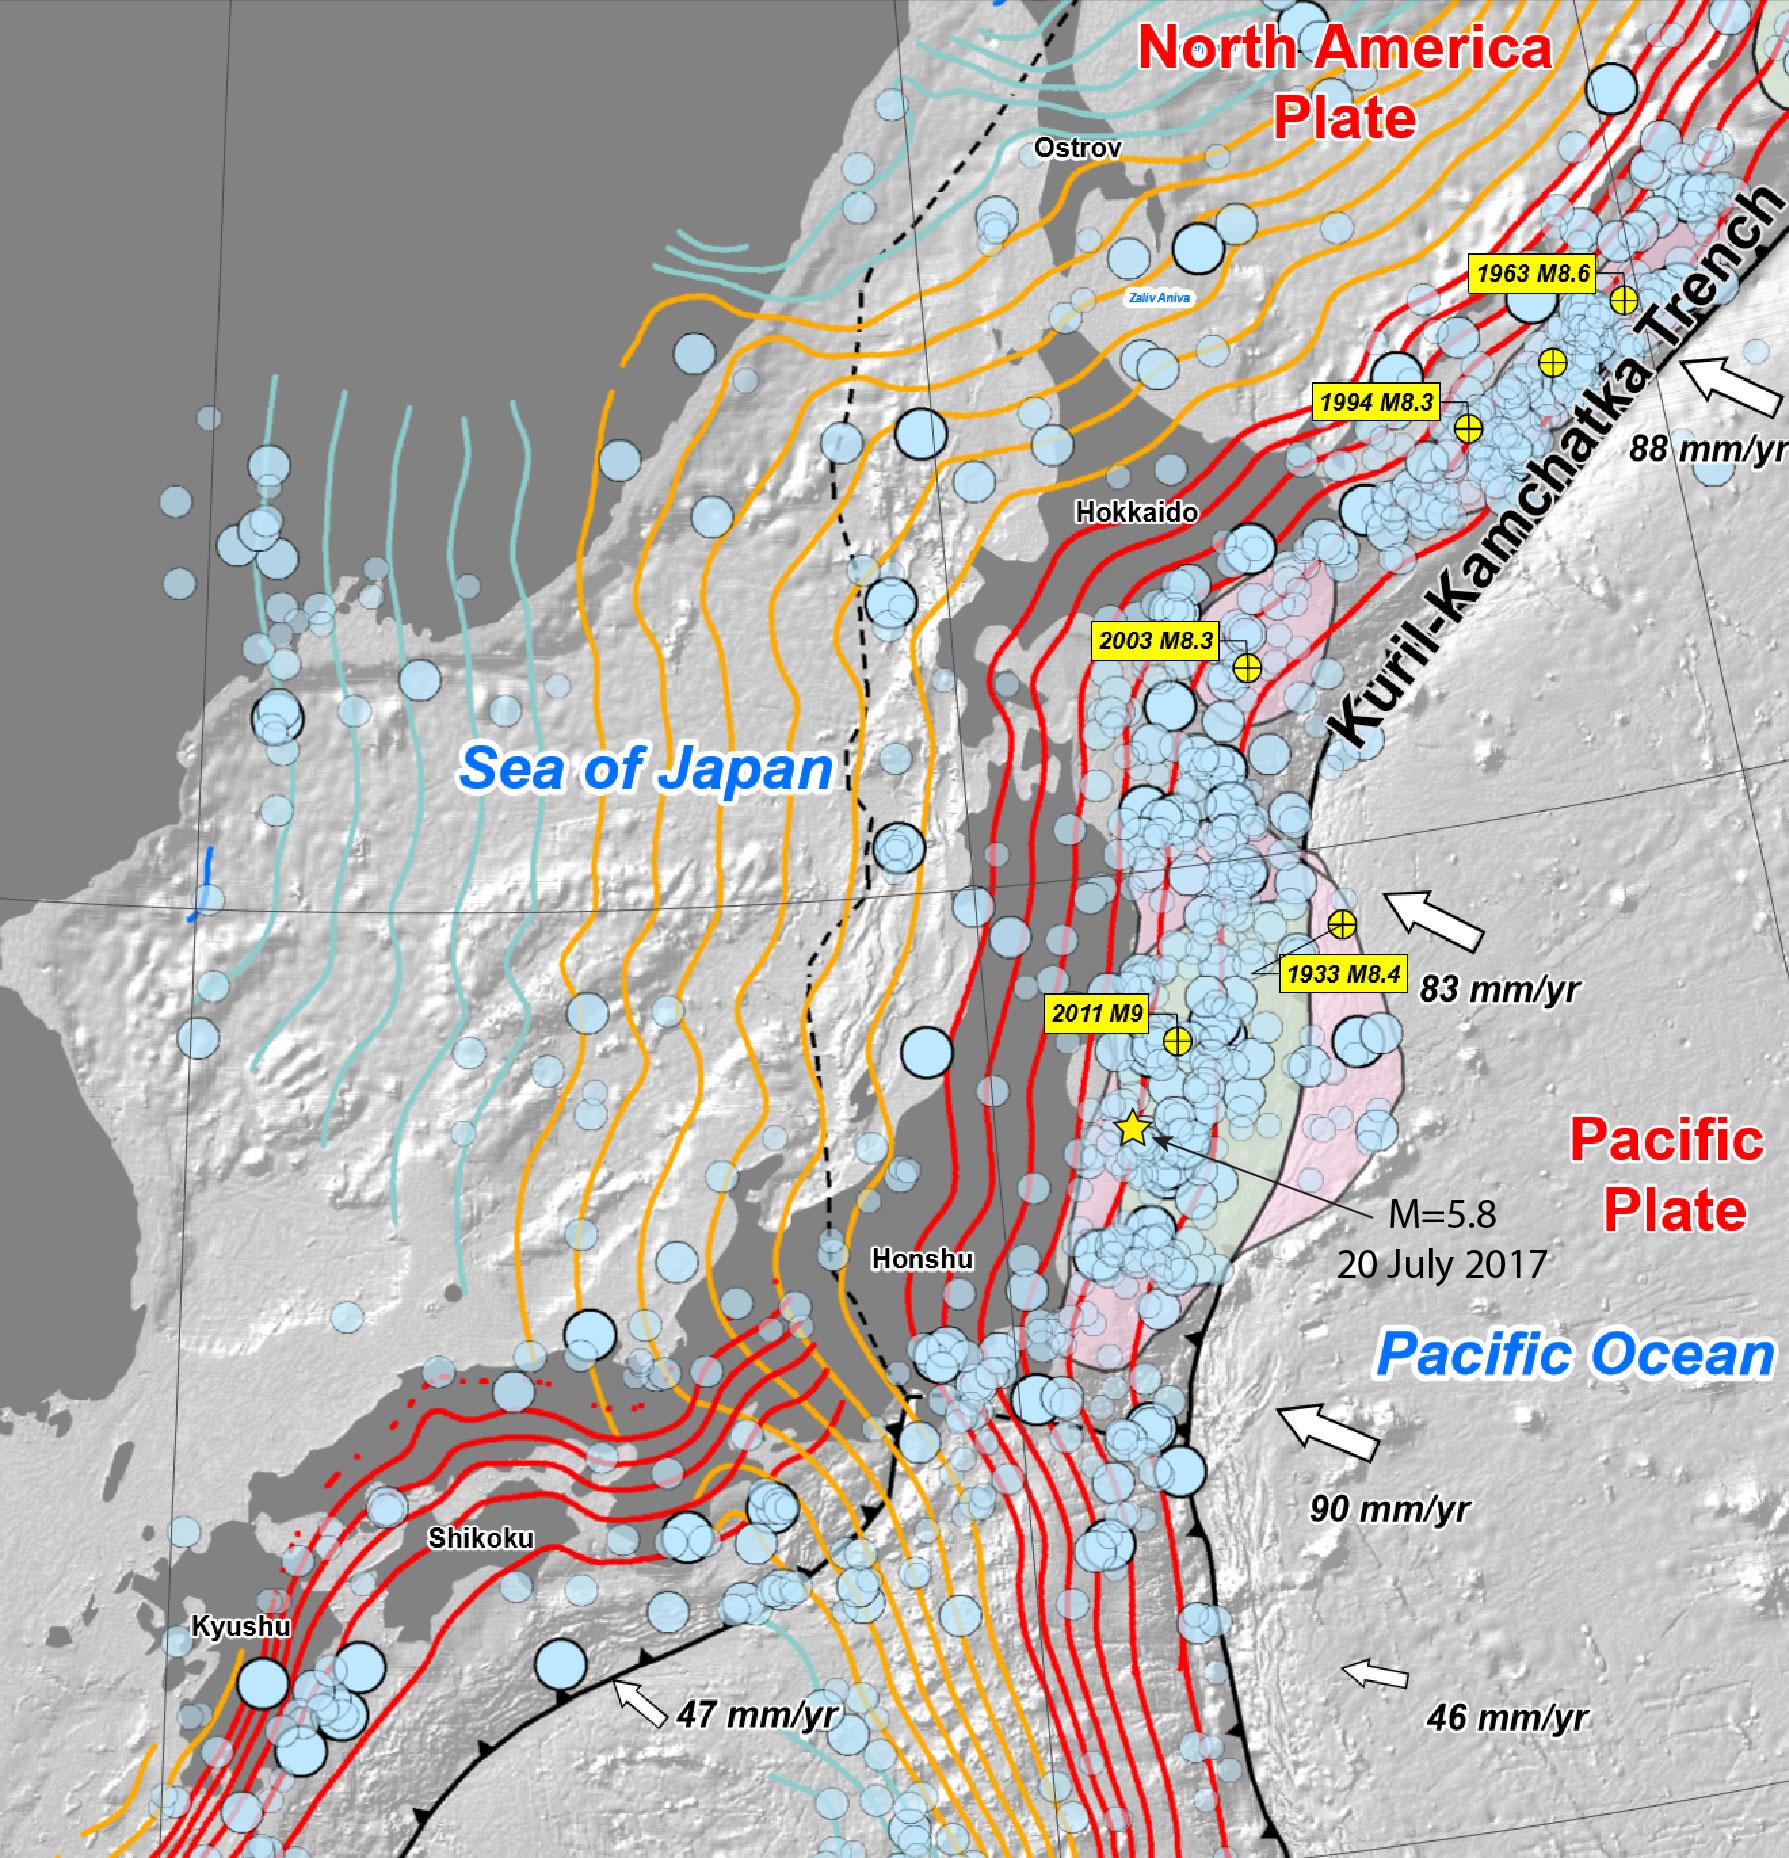 Temblor Science Springs - Los angeles fault zone map